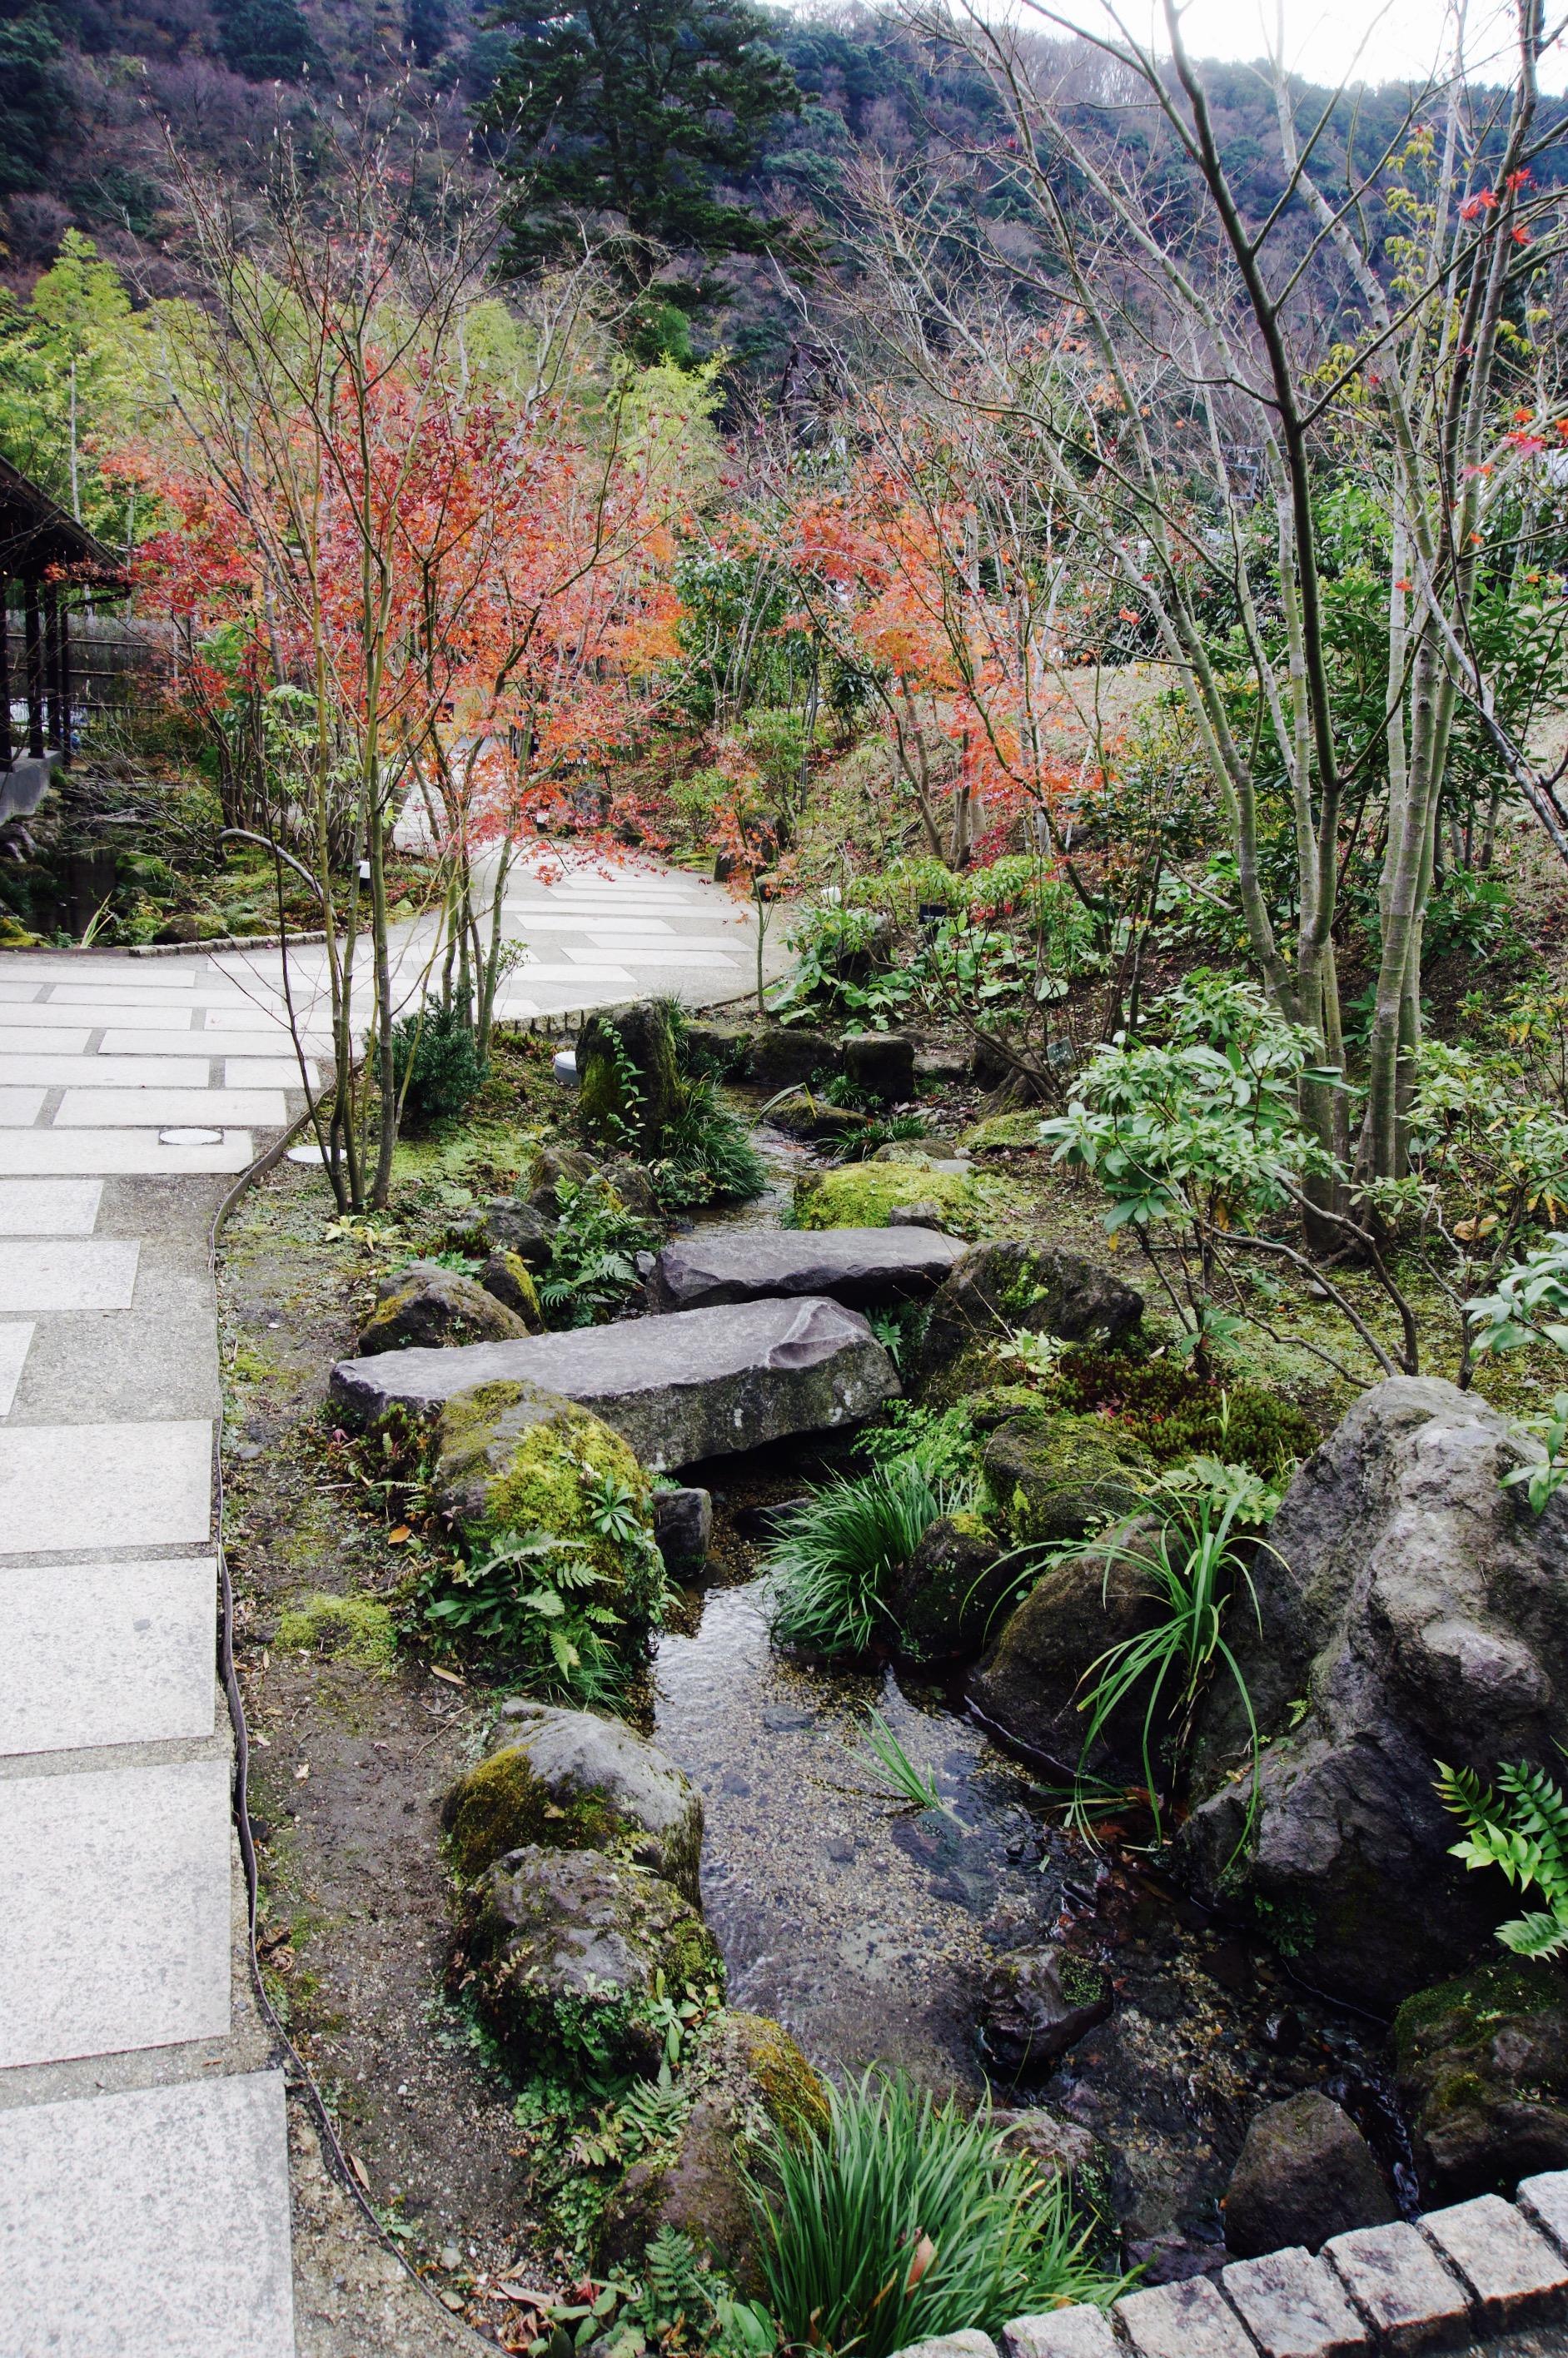 Inside the Hakone Yuryo, so beautiful!